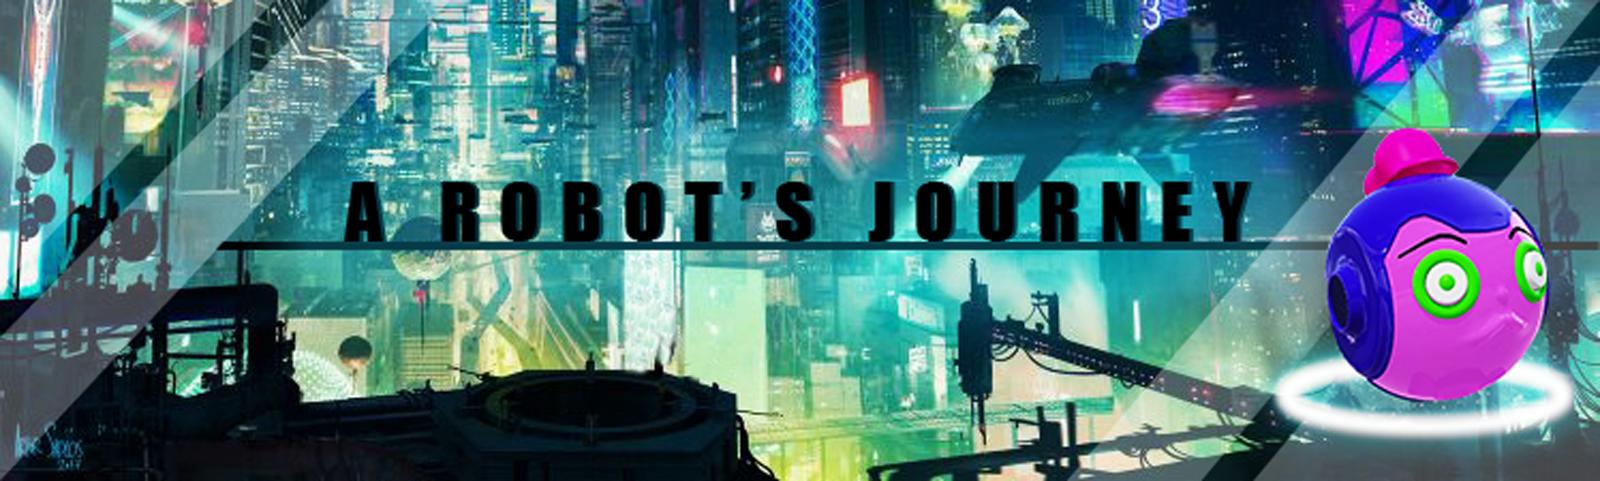 A Robot's Journey